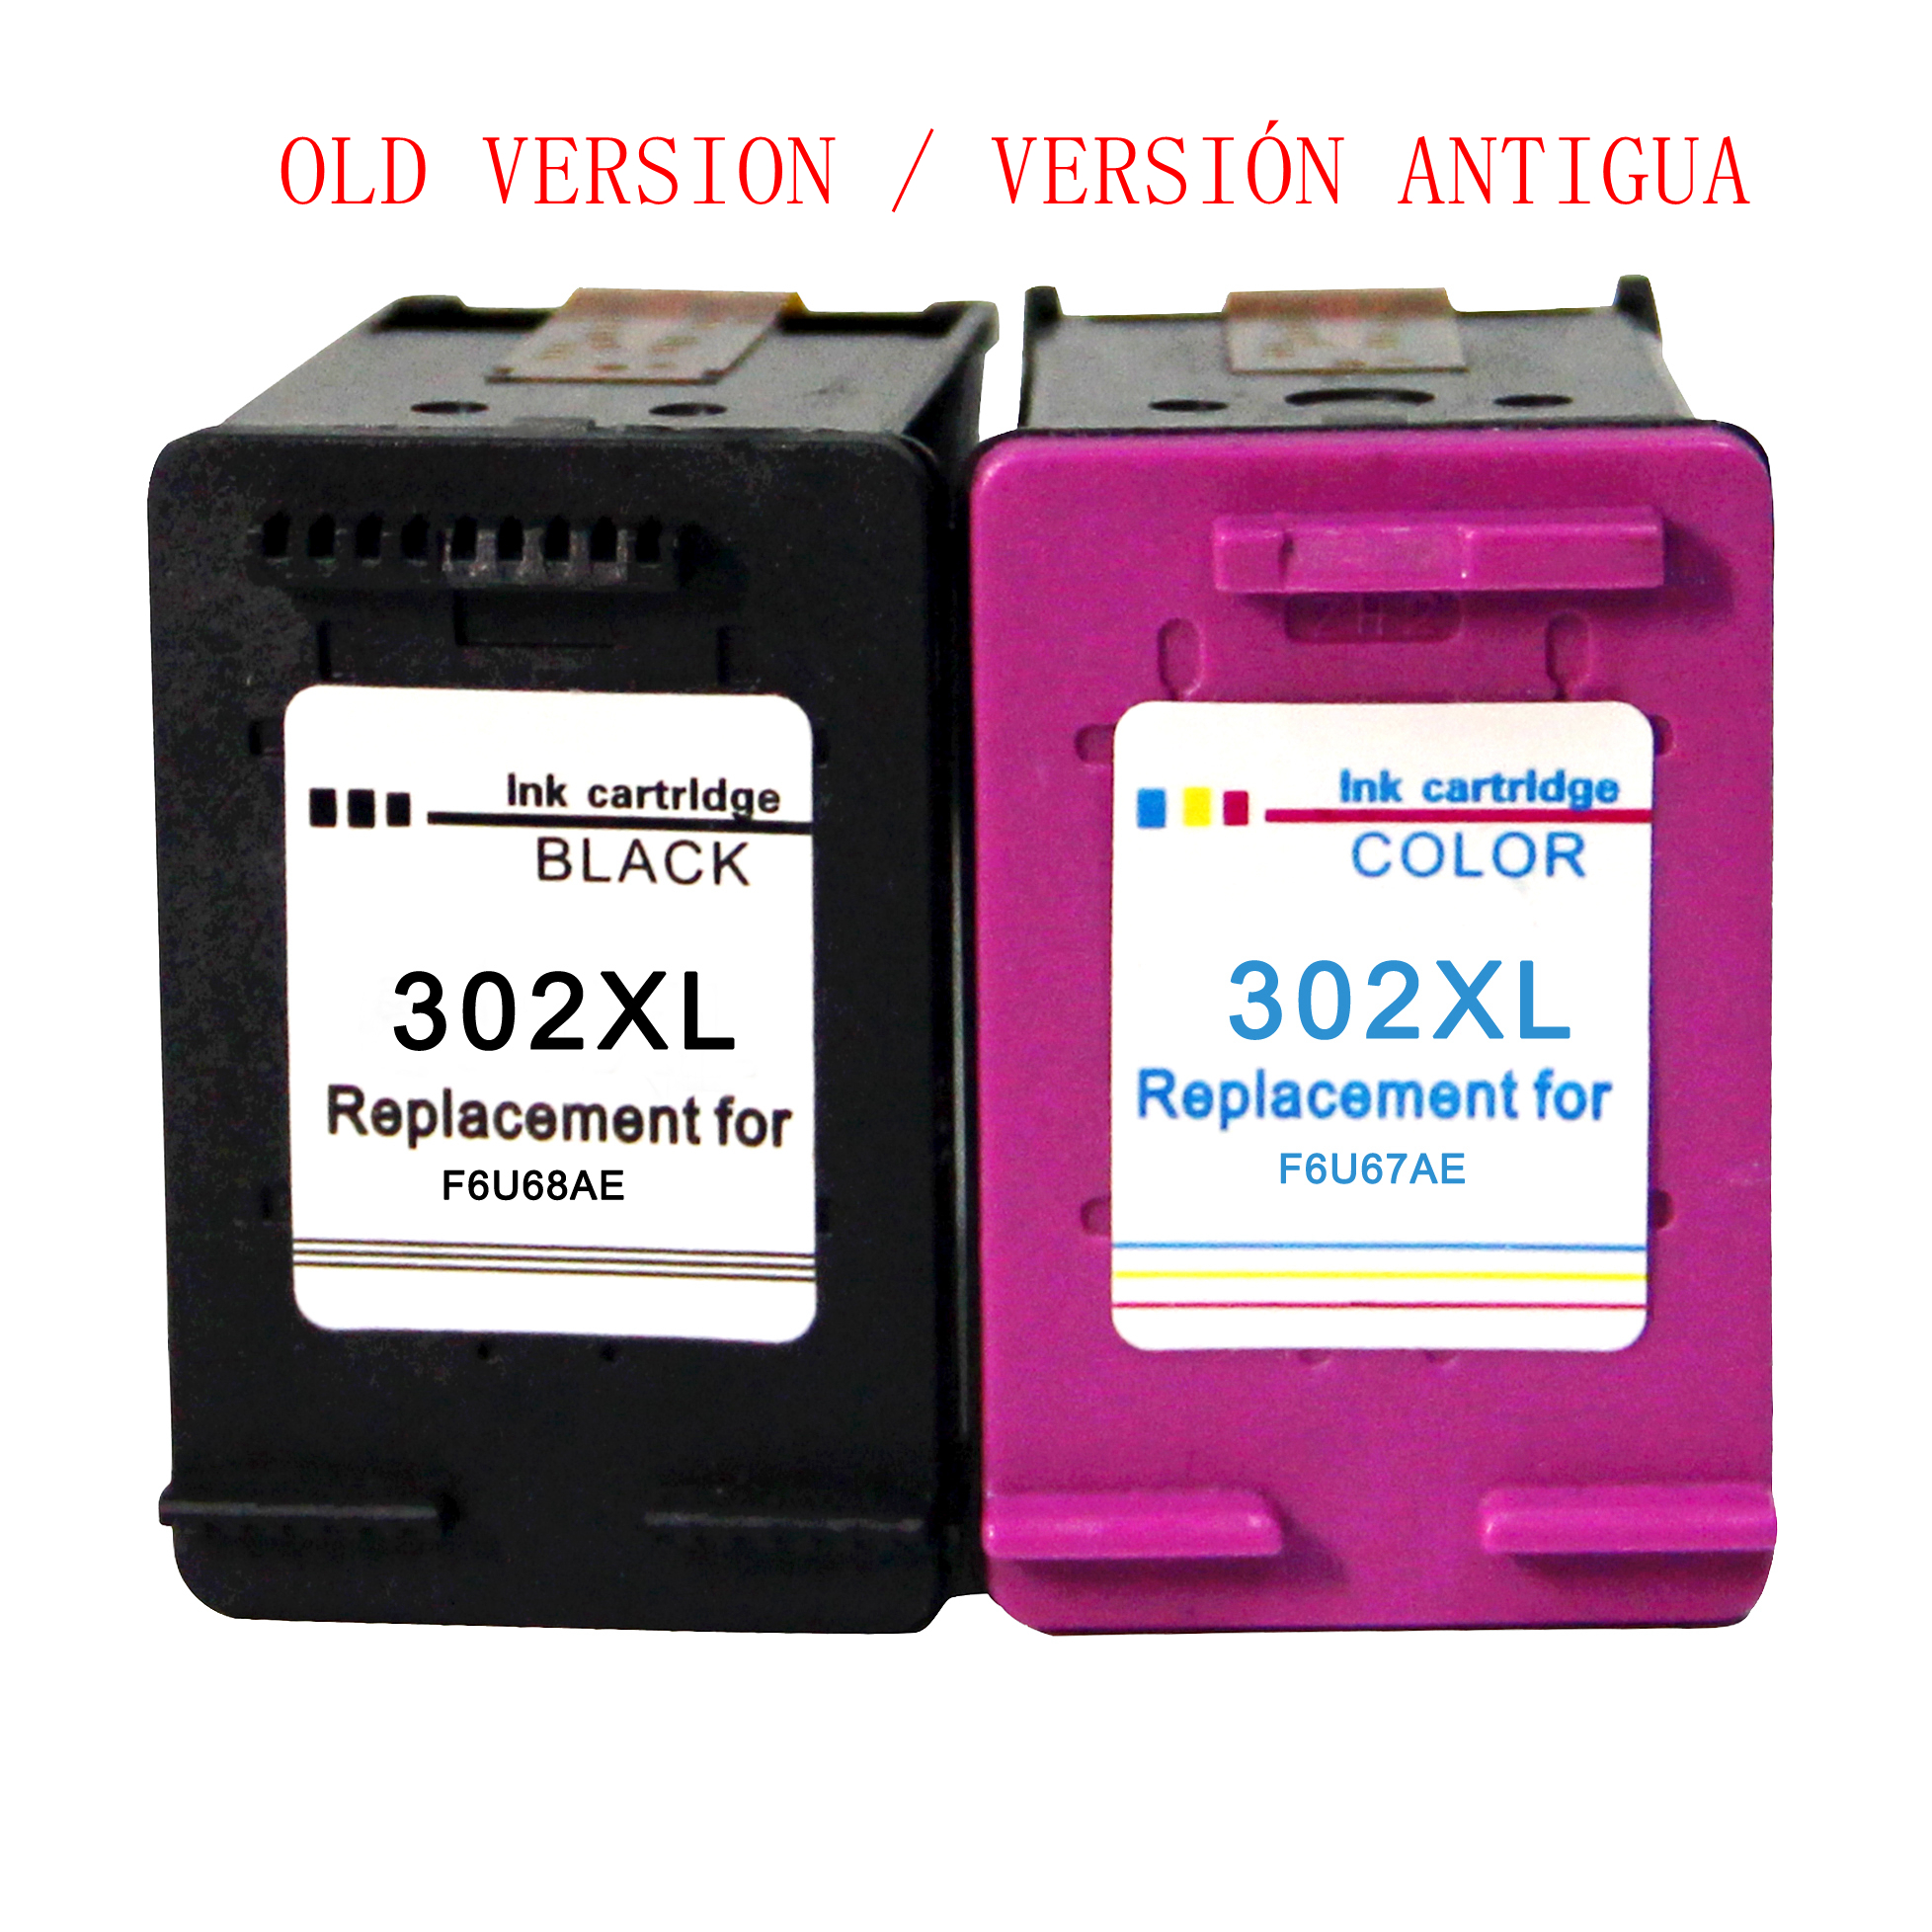 Cartuccia HP 302 XL Cartucce di inchiostro per HP OfficeJet 3831 3833 DeskJet 1110 2130 3630 3639 3633 3636 Envy 4520 4524